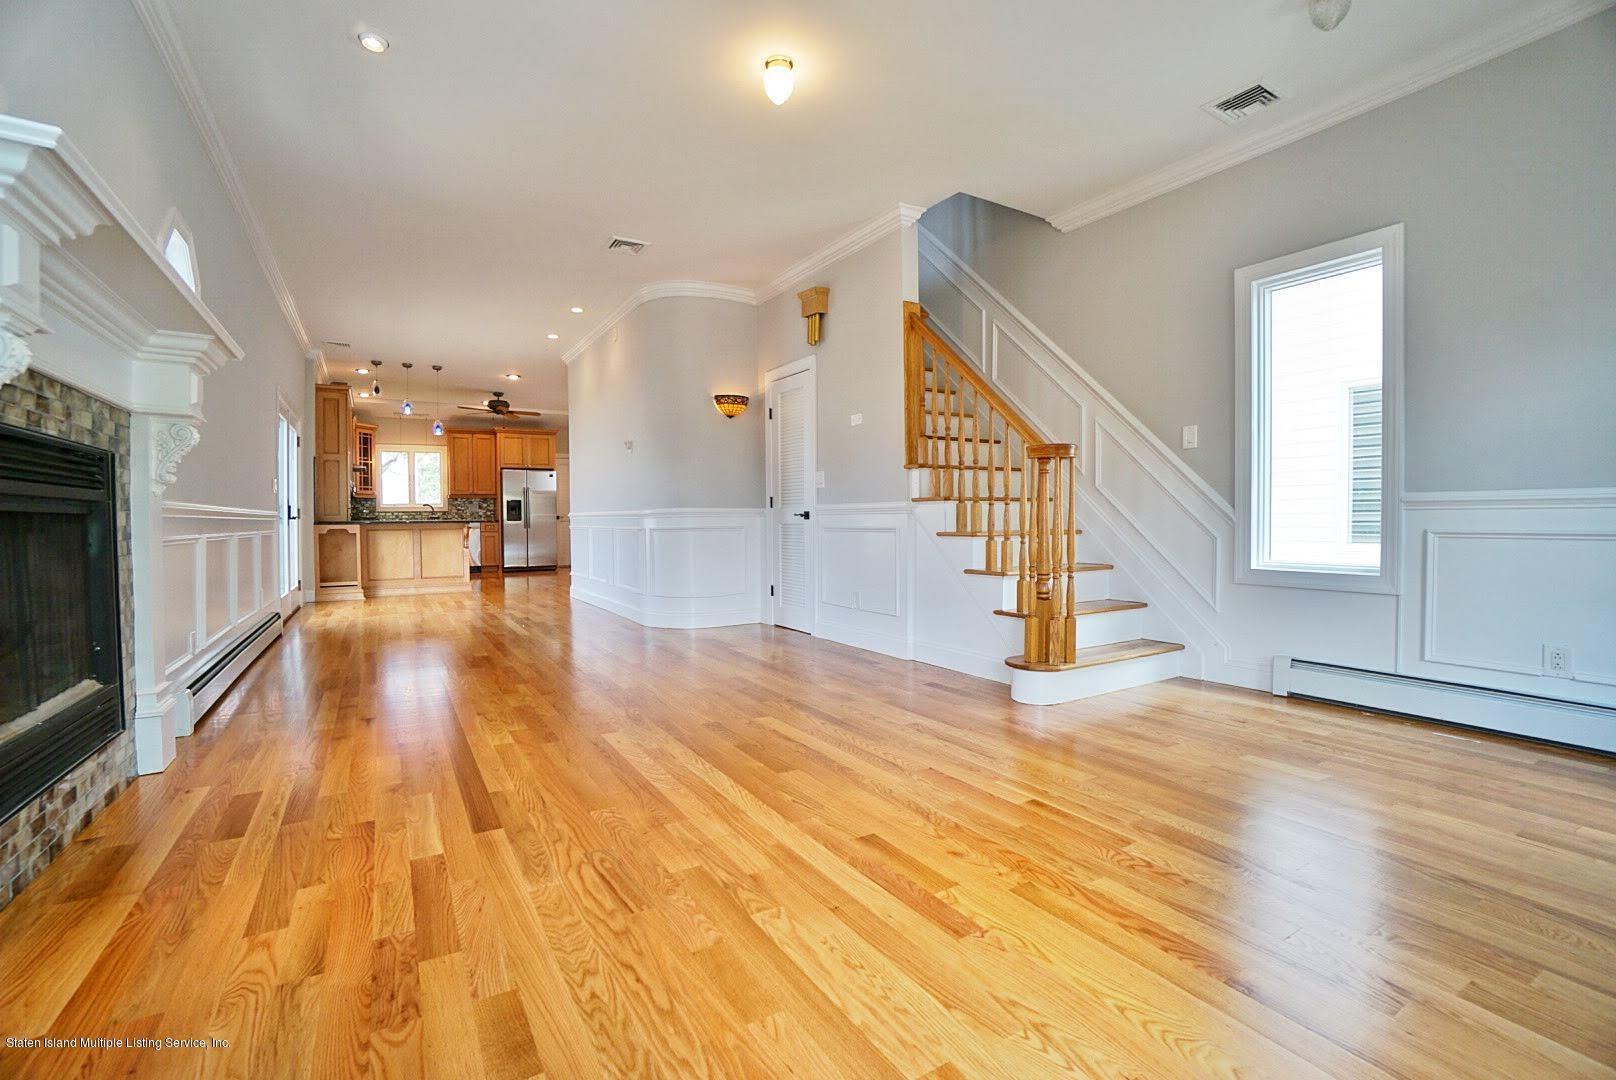 Single Family - Detached 445 Manhattan Street  Staten Island, NY 10307, MLS-1130505-6